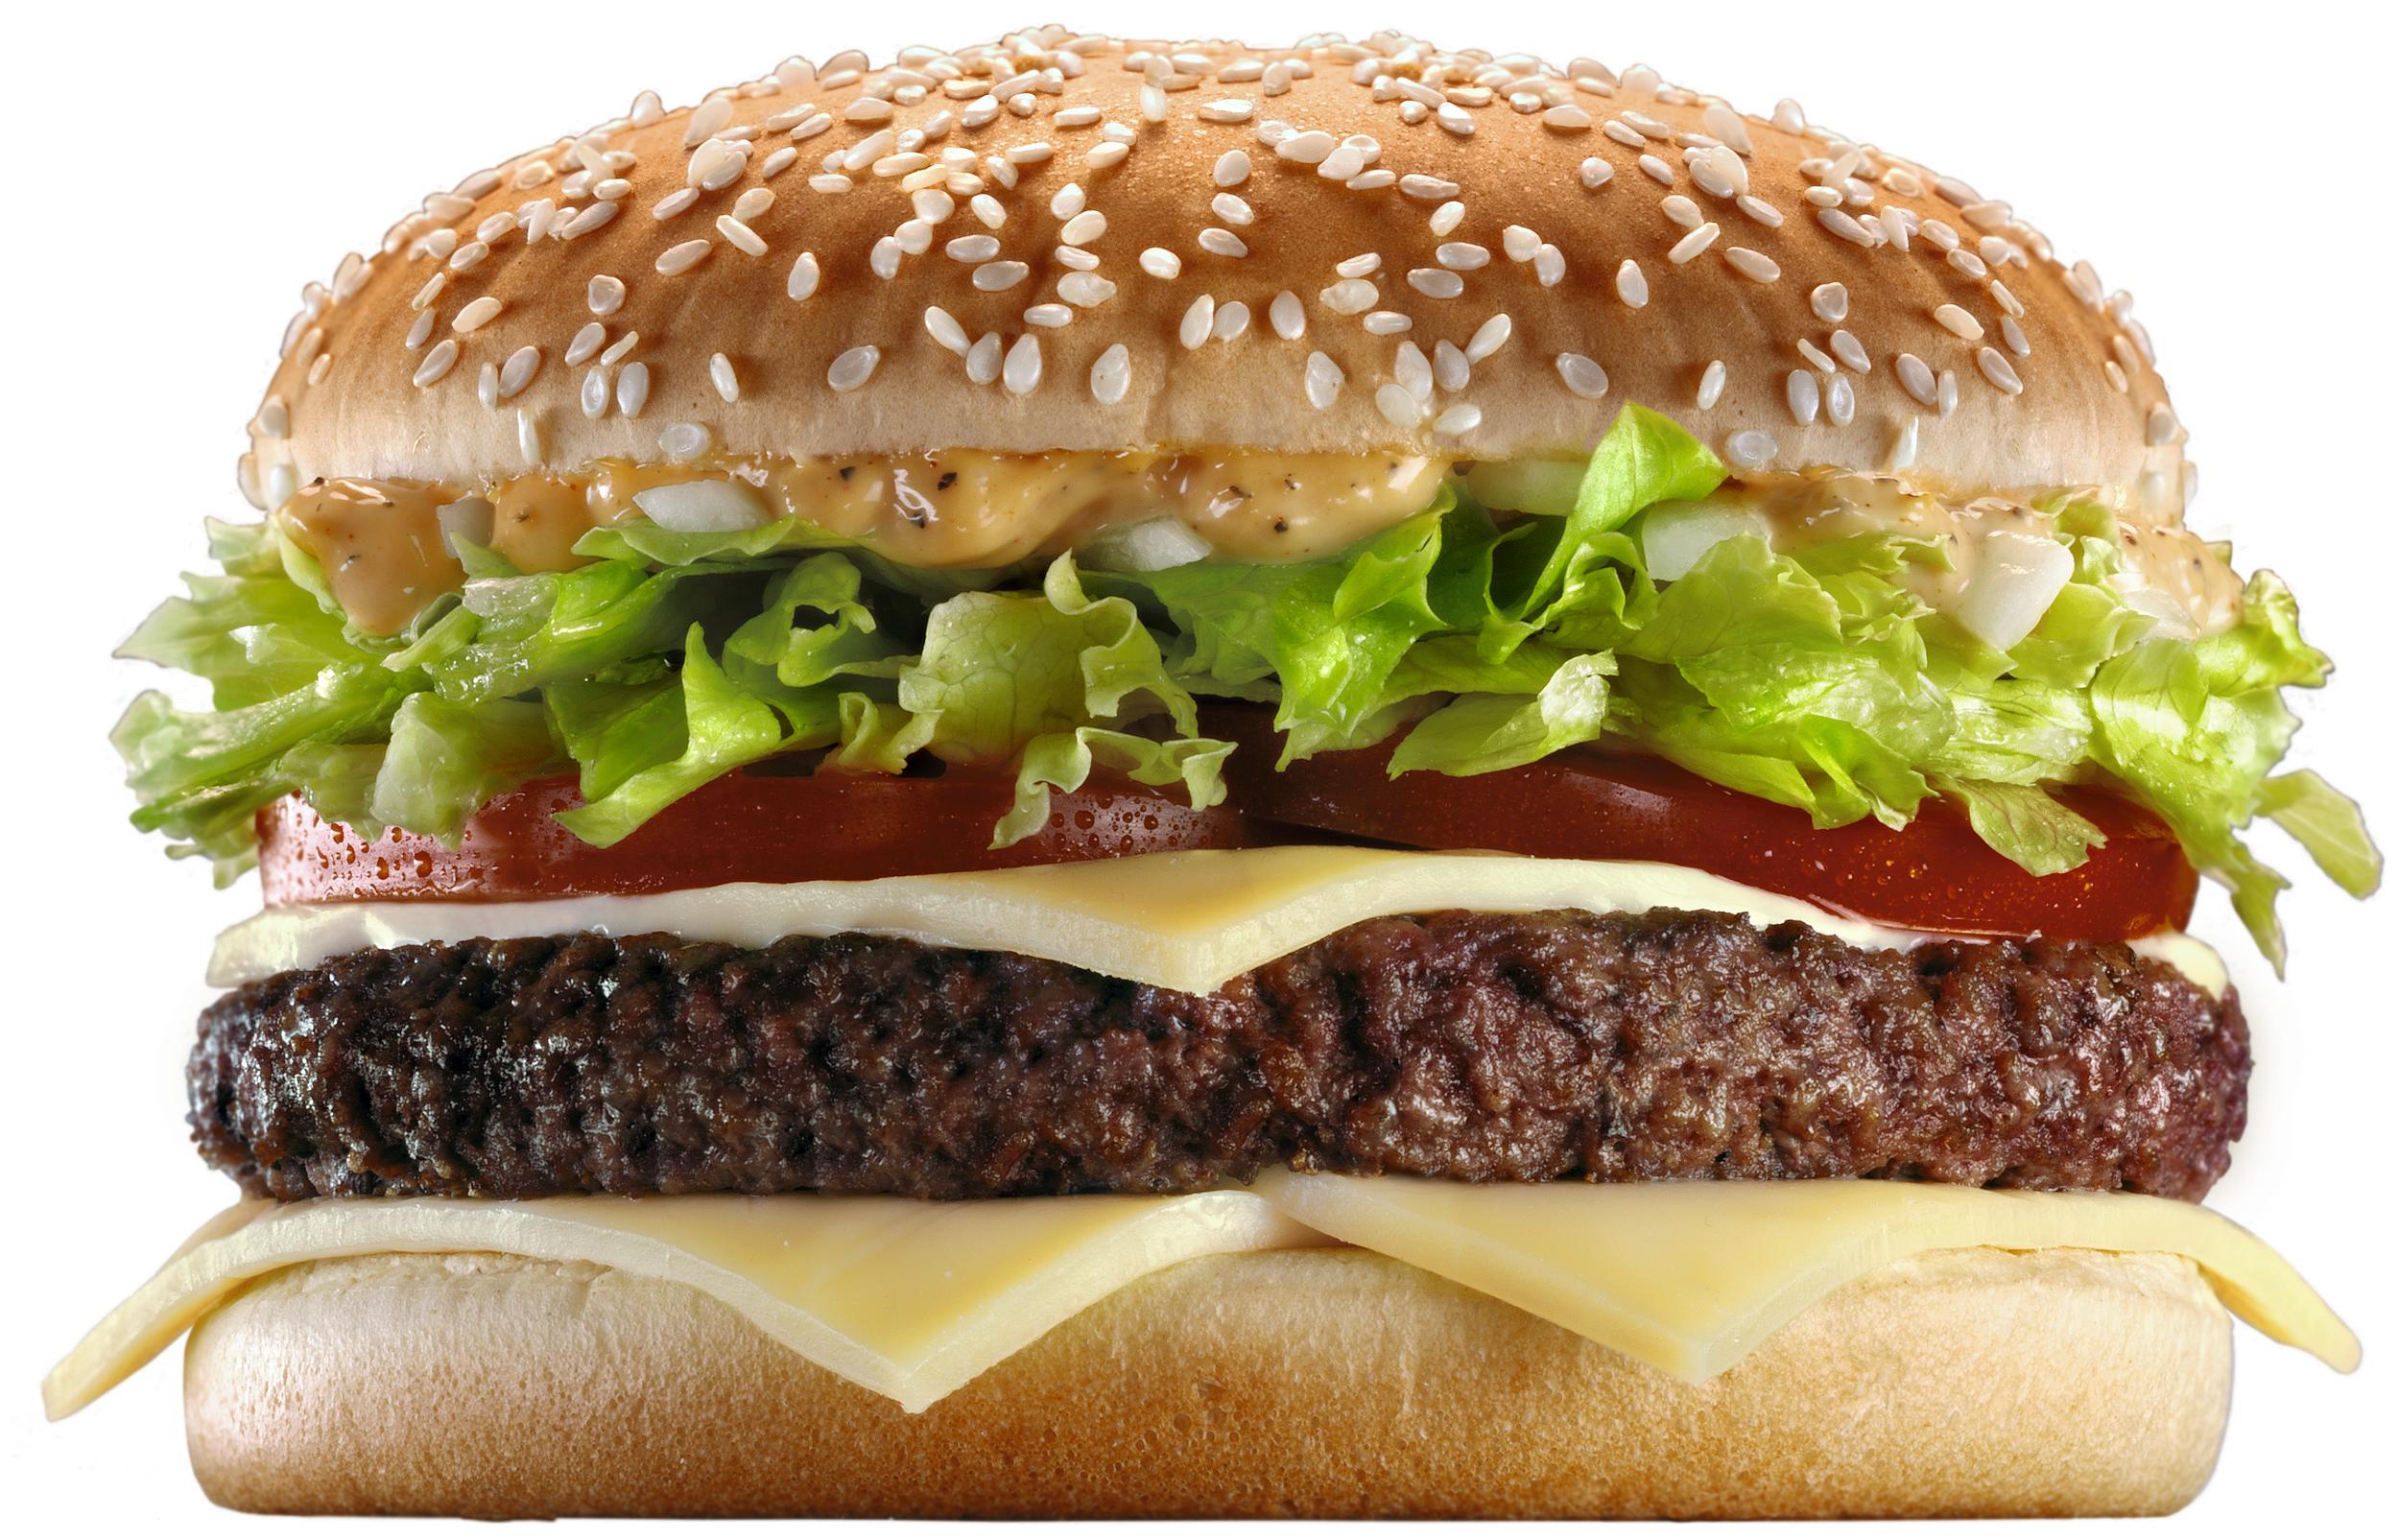 Big Tasty Mac Donalds